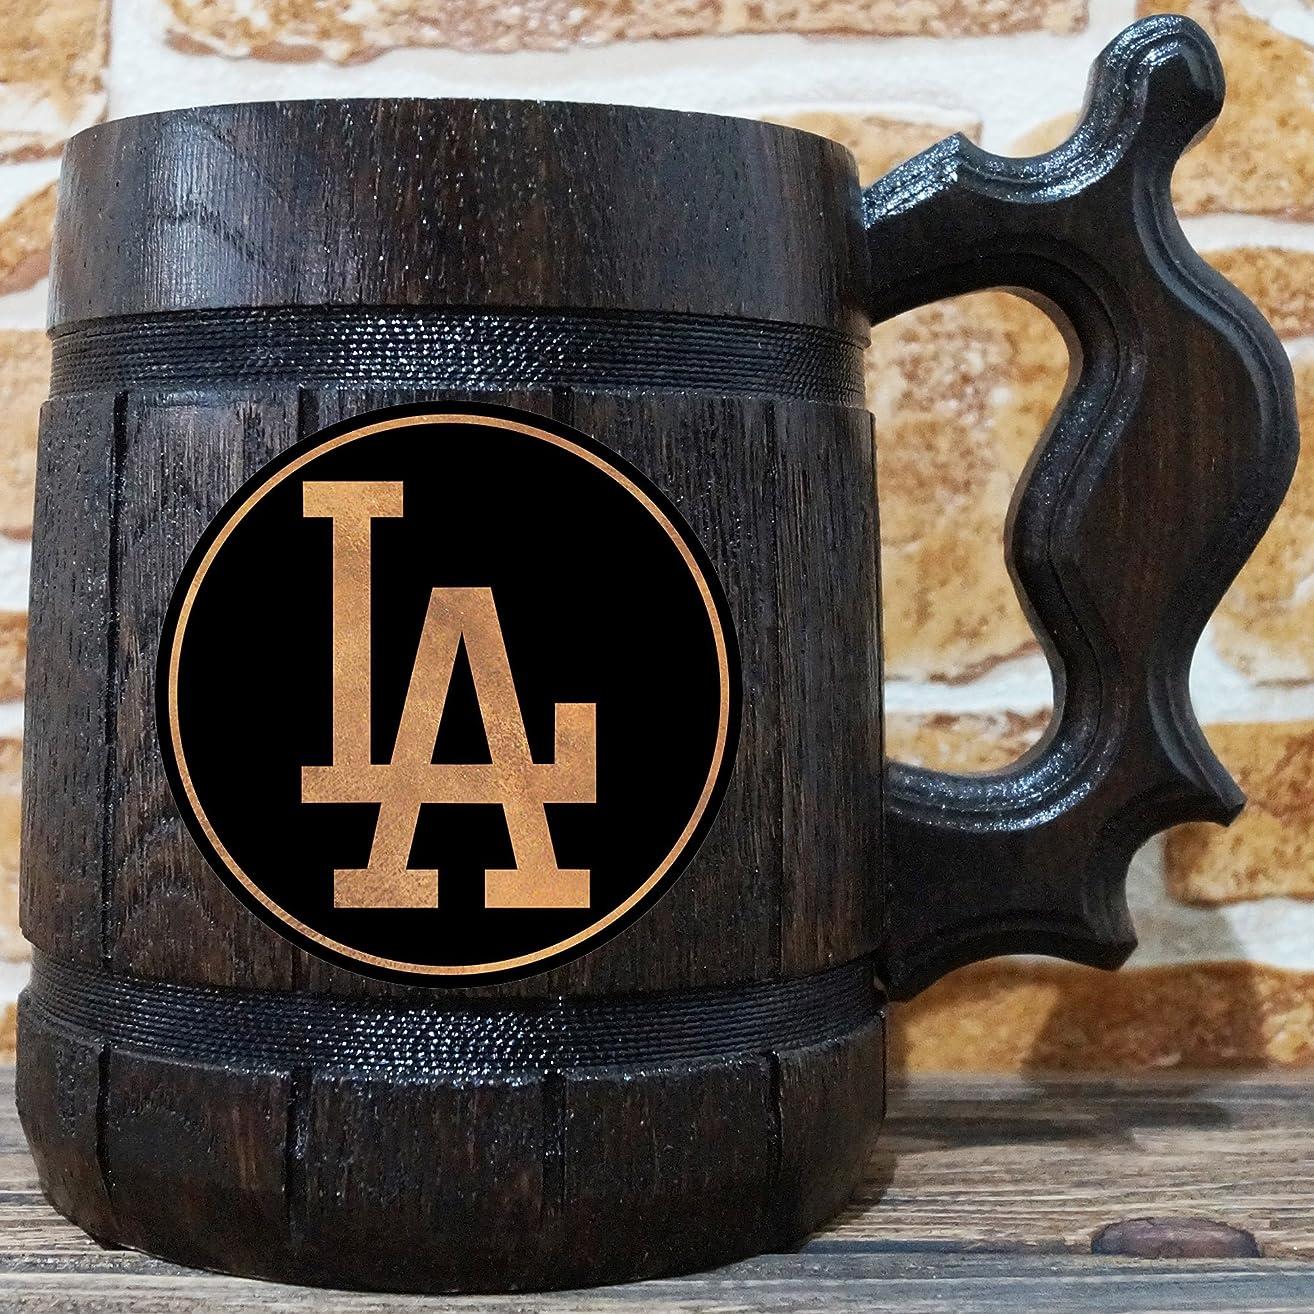 Los Angeles Dodgers Beer Mug, Baseball Wooden Beer Stein, Sport Gift, Personalized Beer Stein, Los Angeles Dodgers Tankard, Custom Gift for Men, Gift for Him